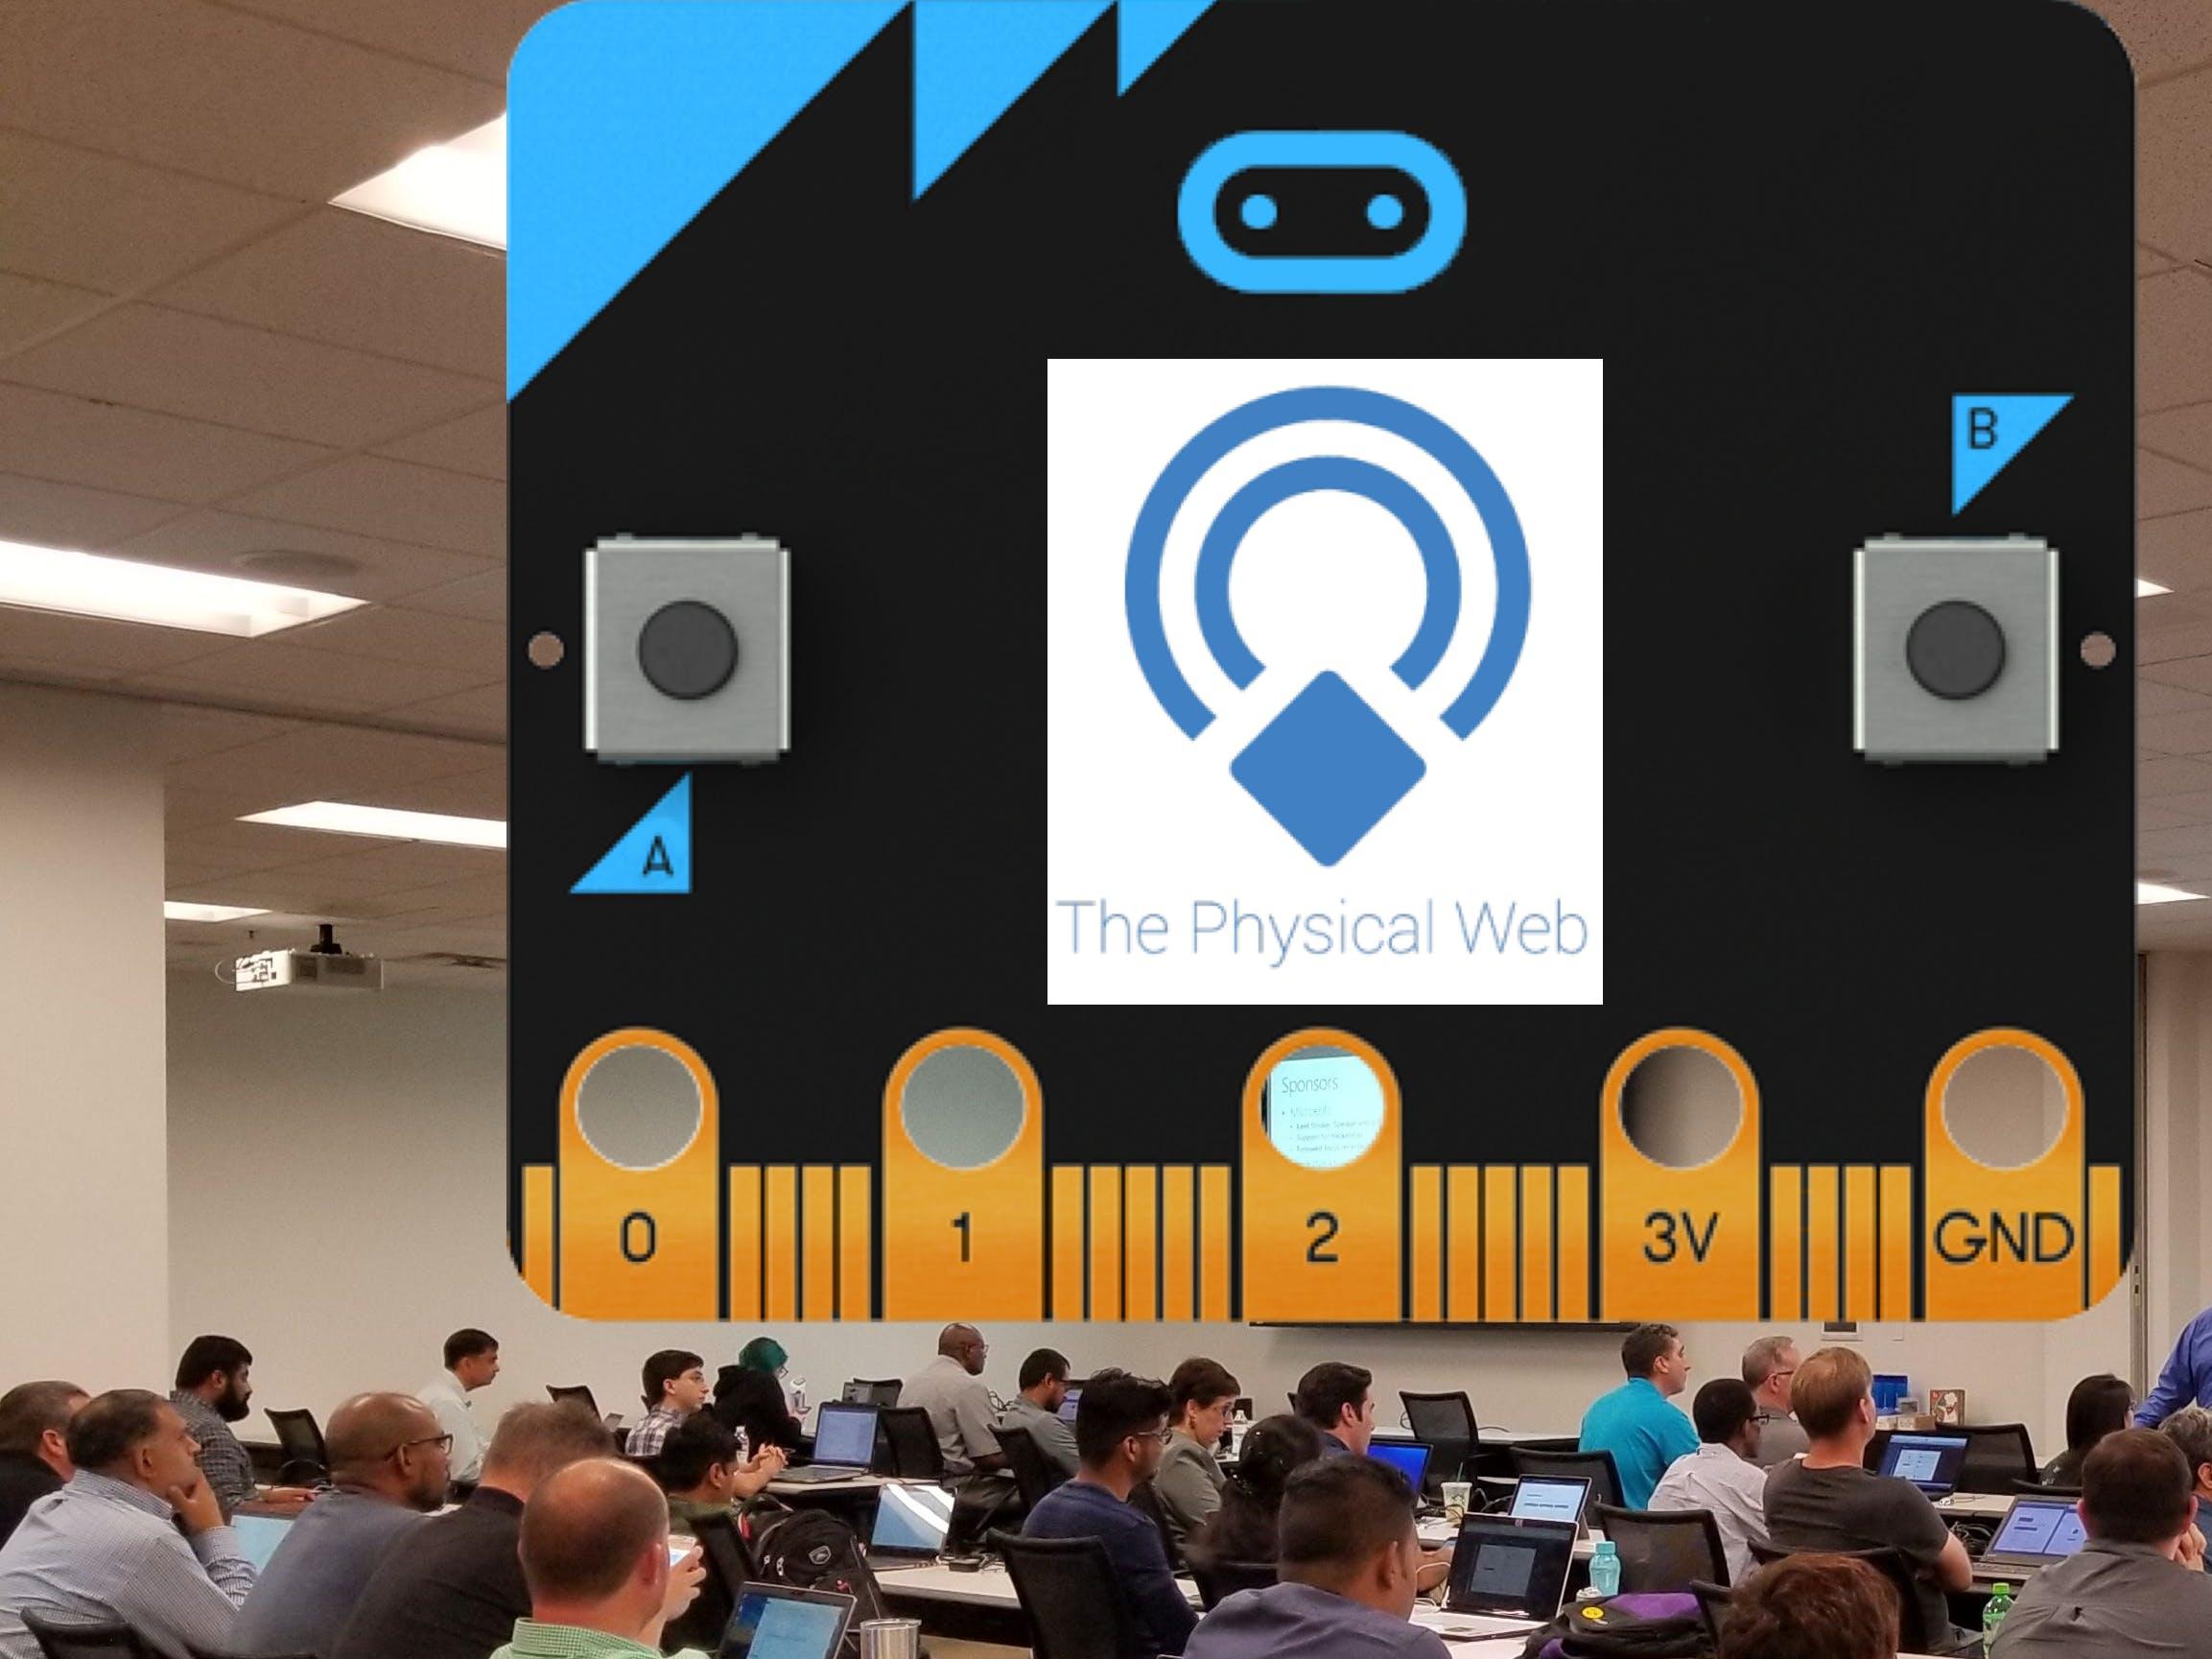 Sharing Presentation Slides: Physical Web using Micro:bit